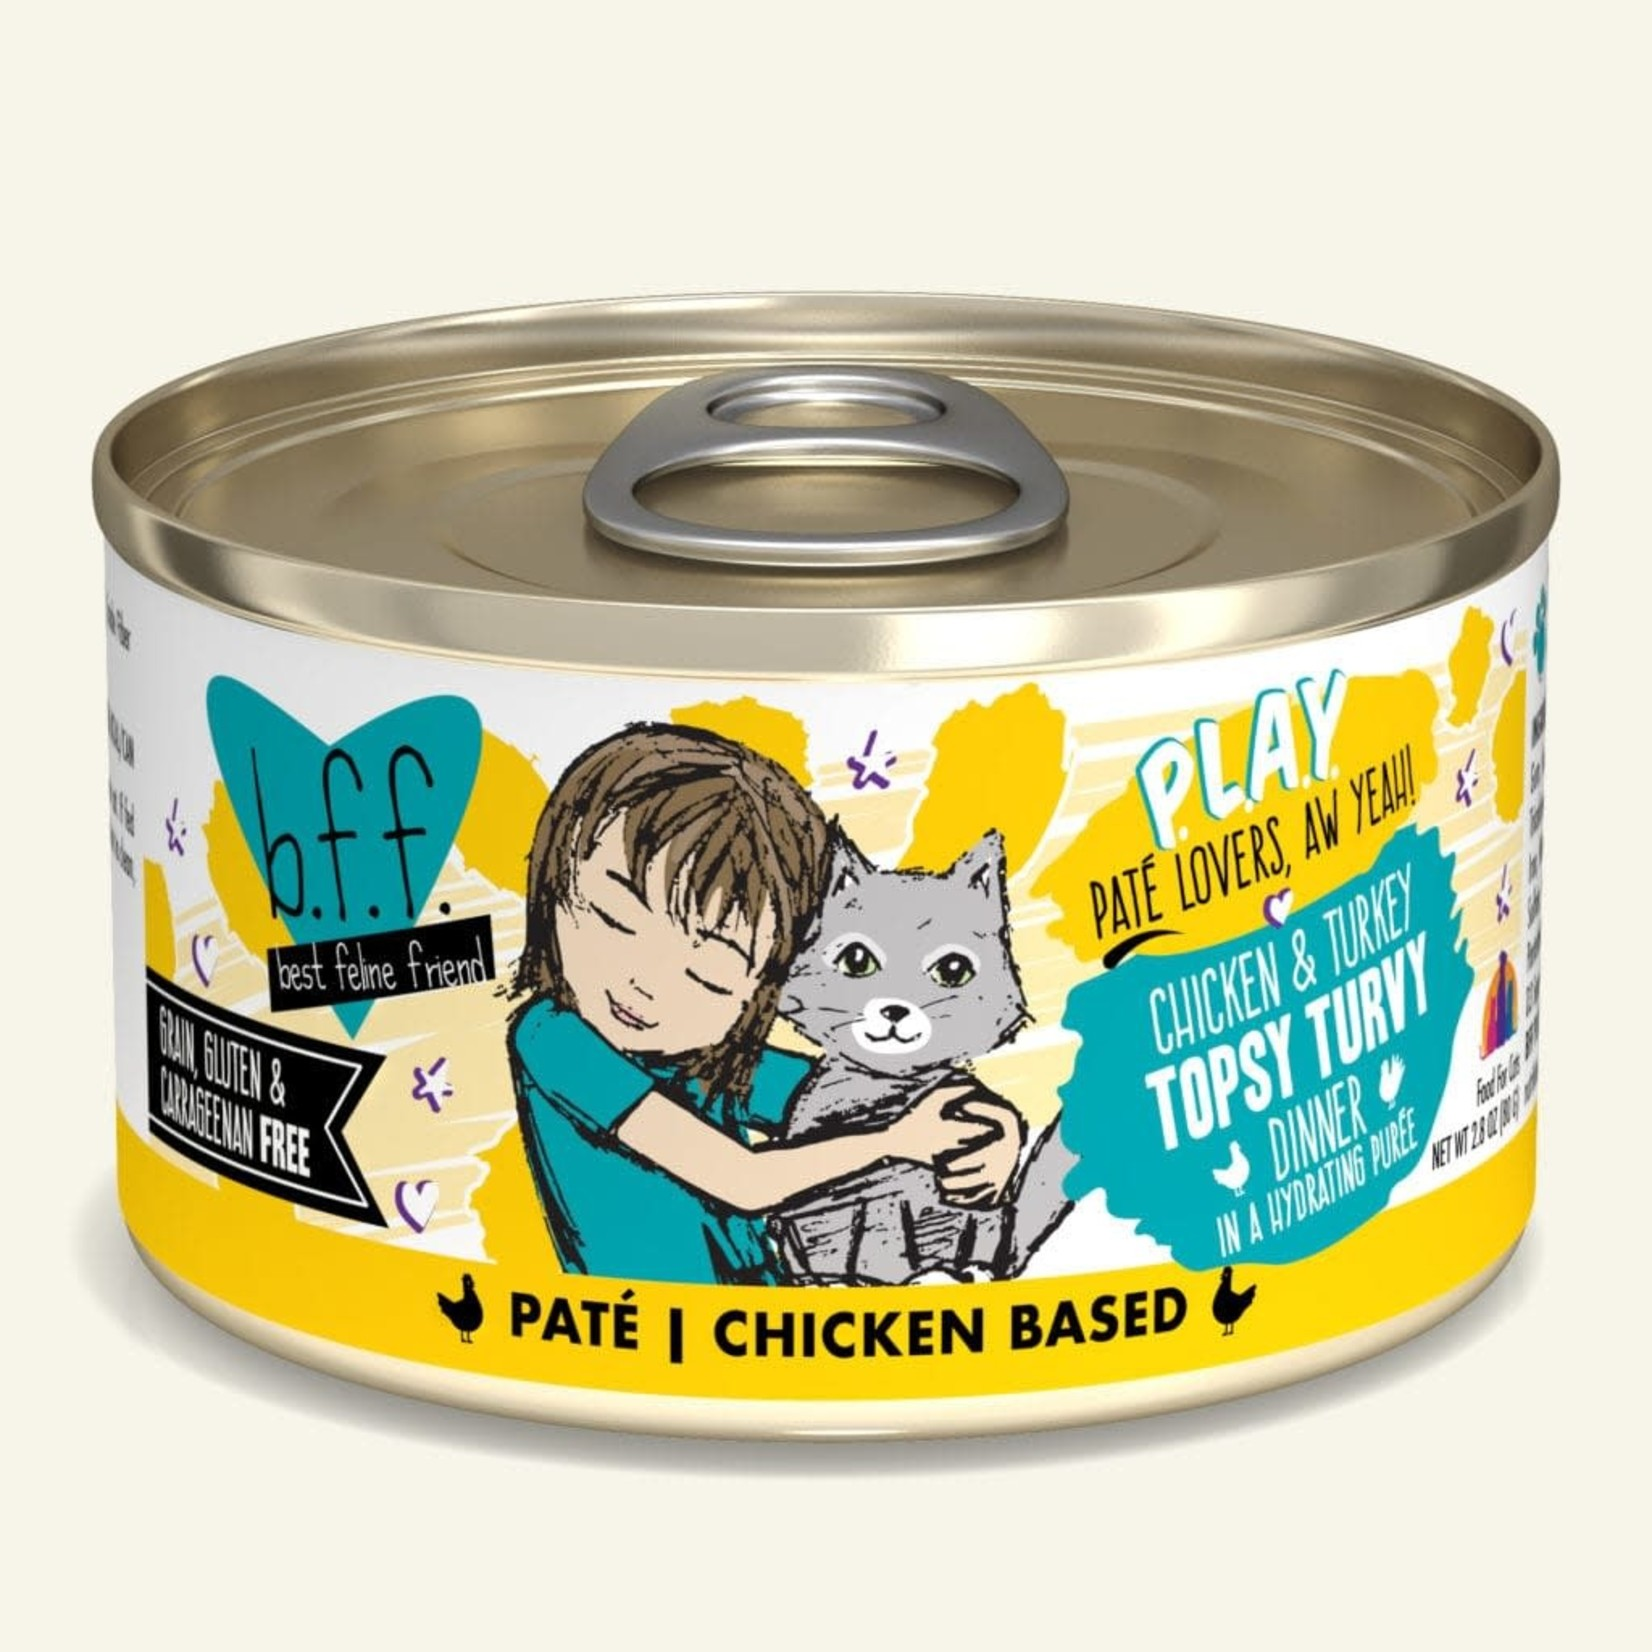 Weruva BFF PLAY Cat Chicken & Turkey Topsy Turvy 2.8 OZ